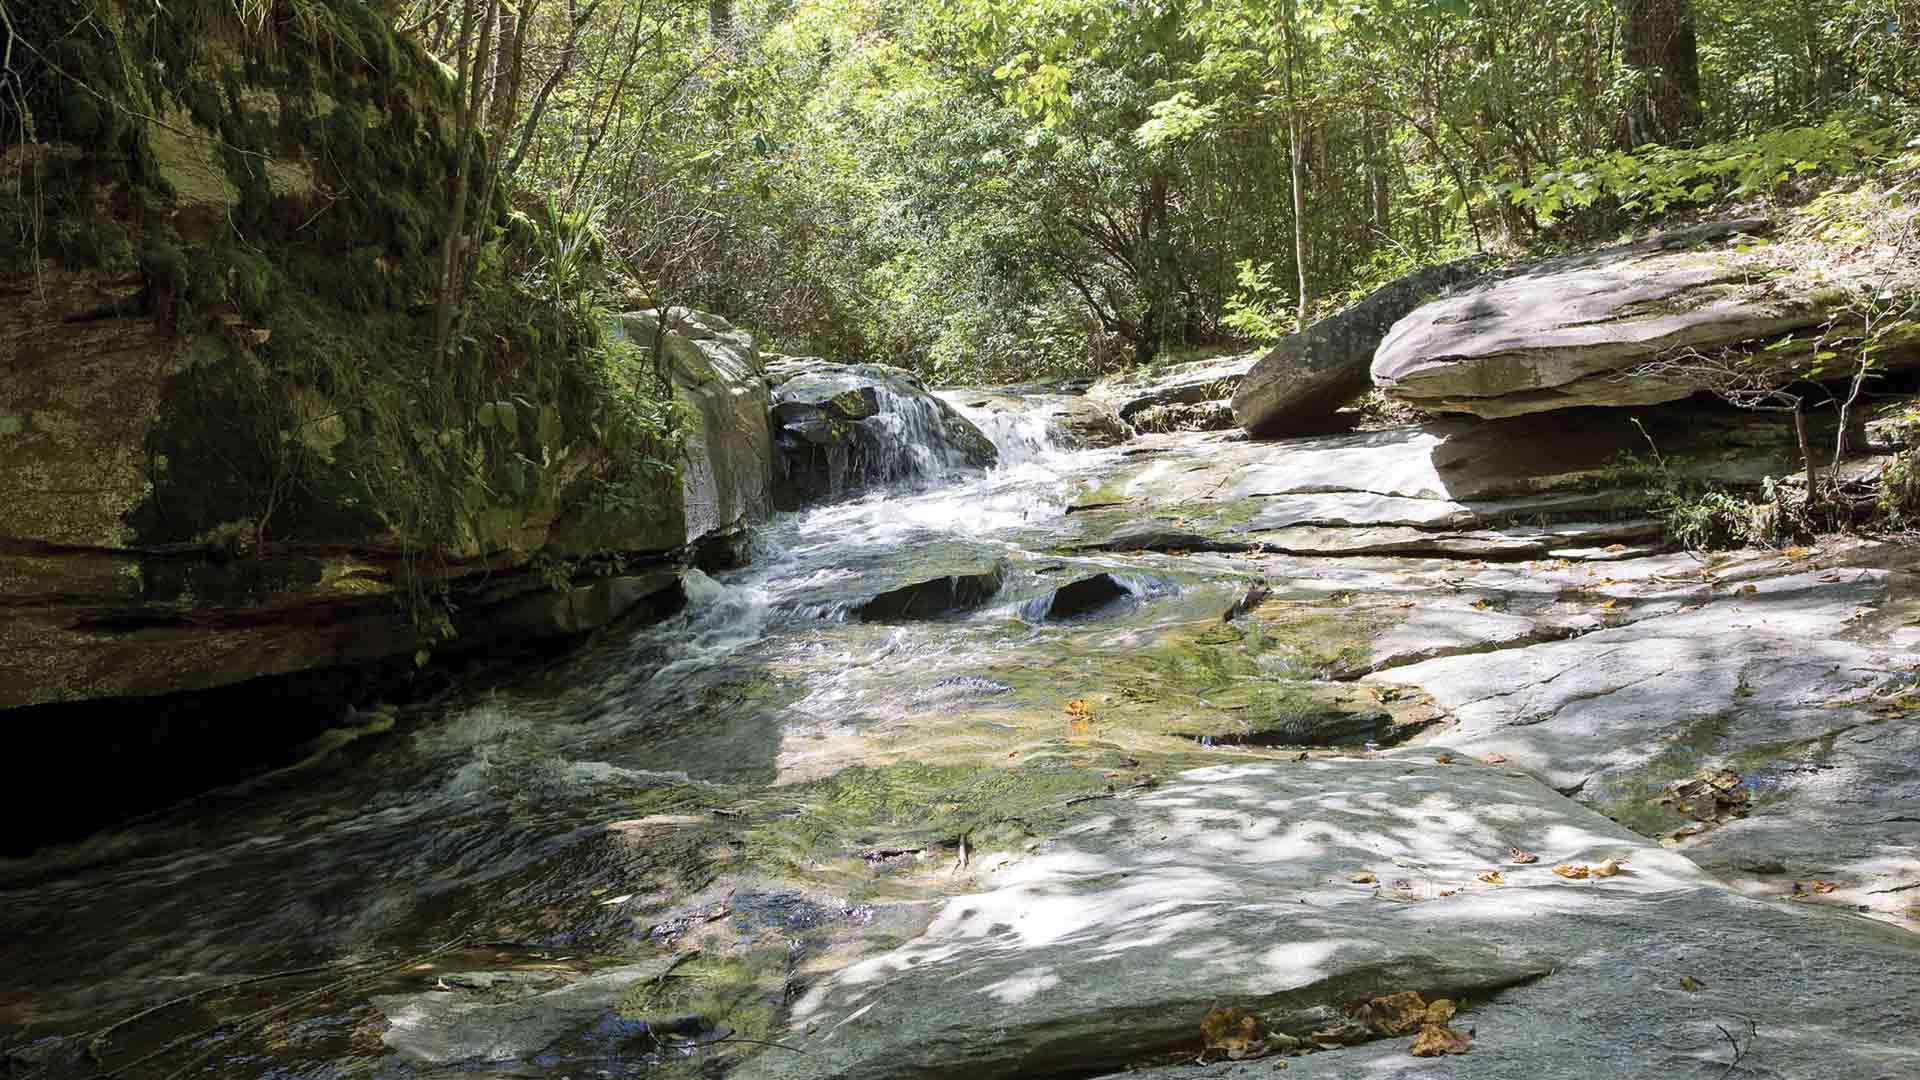 waterfall stream alongside hiking trail